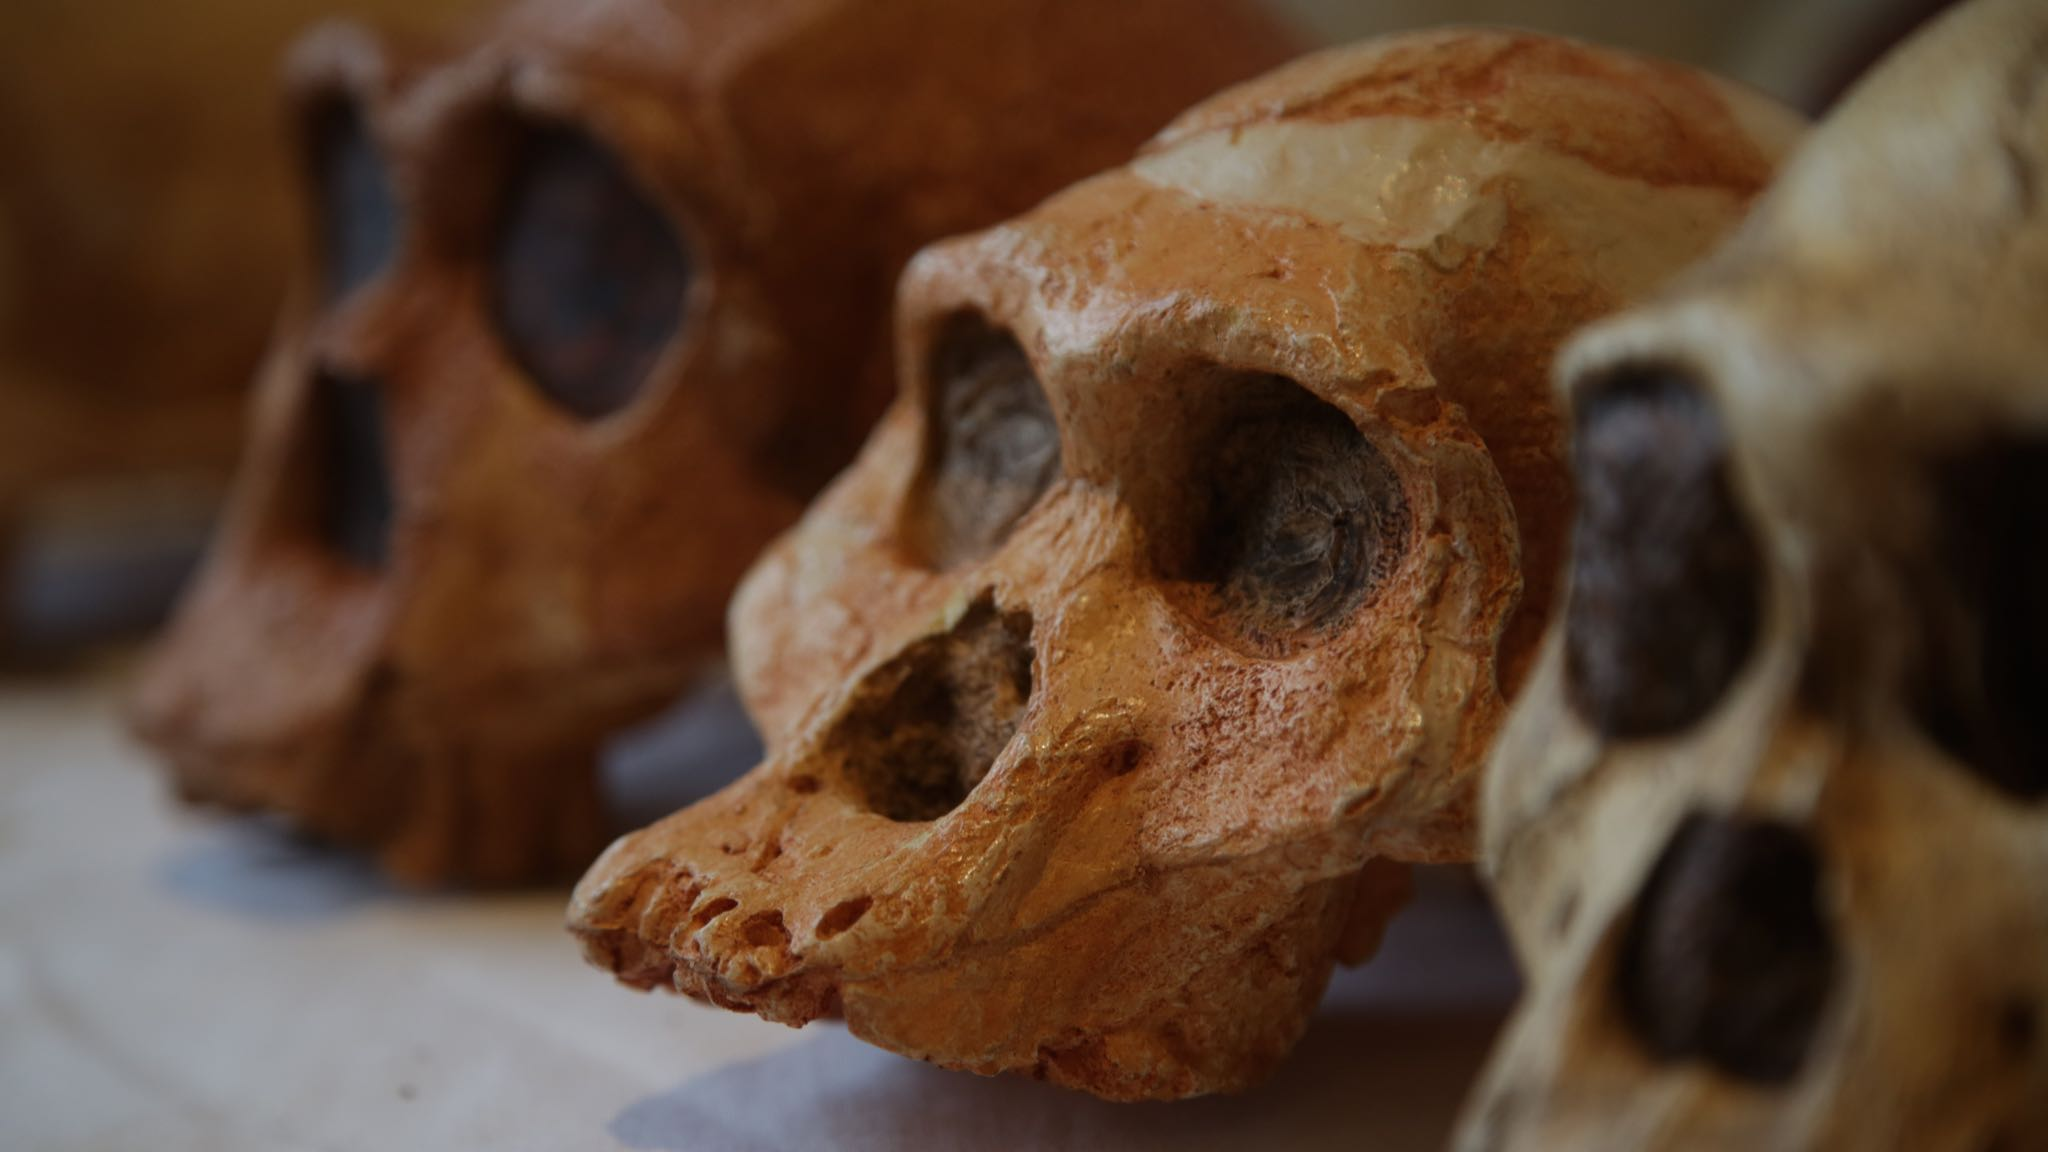 australopith-early-hominin-skulls